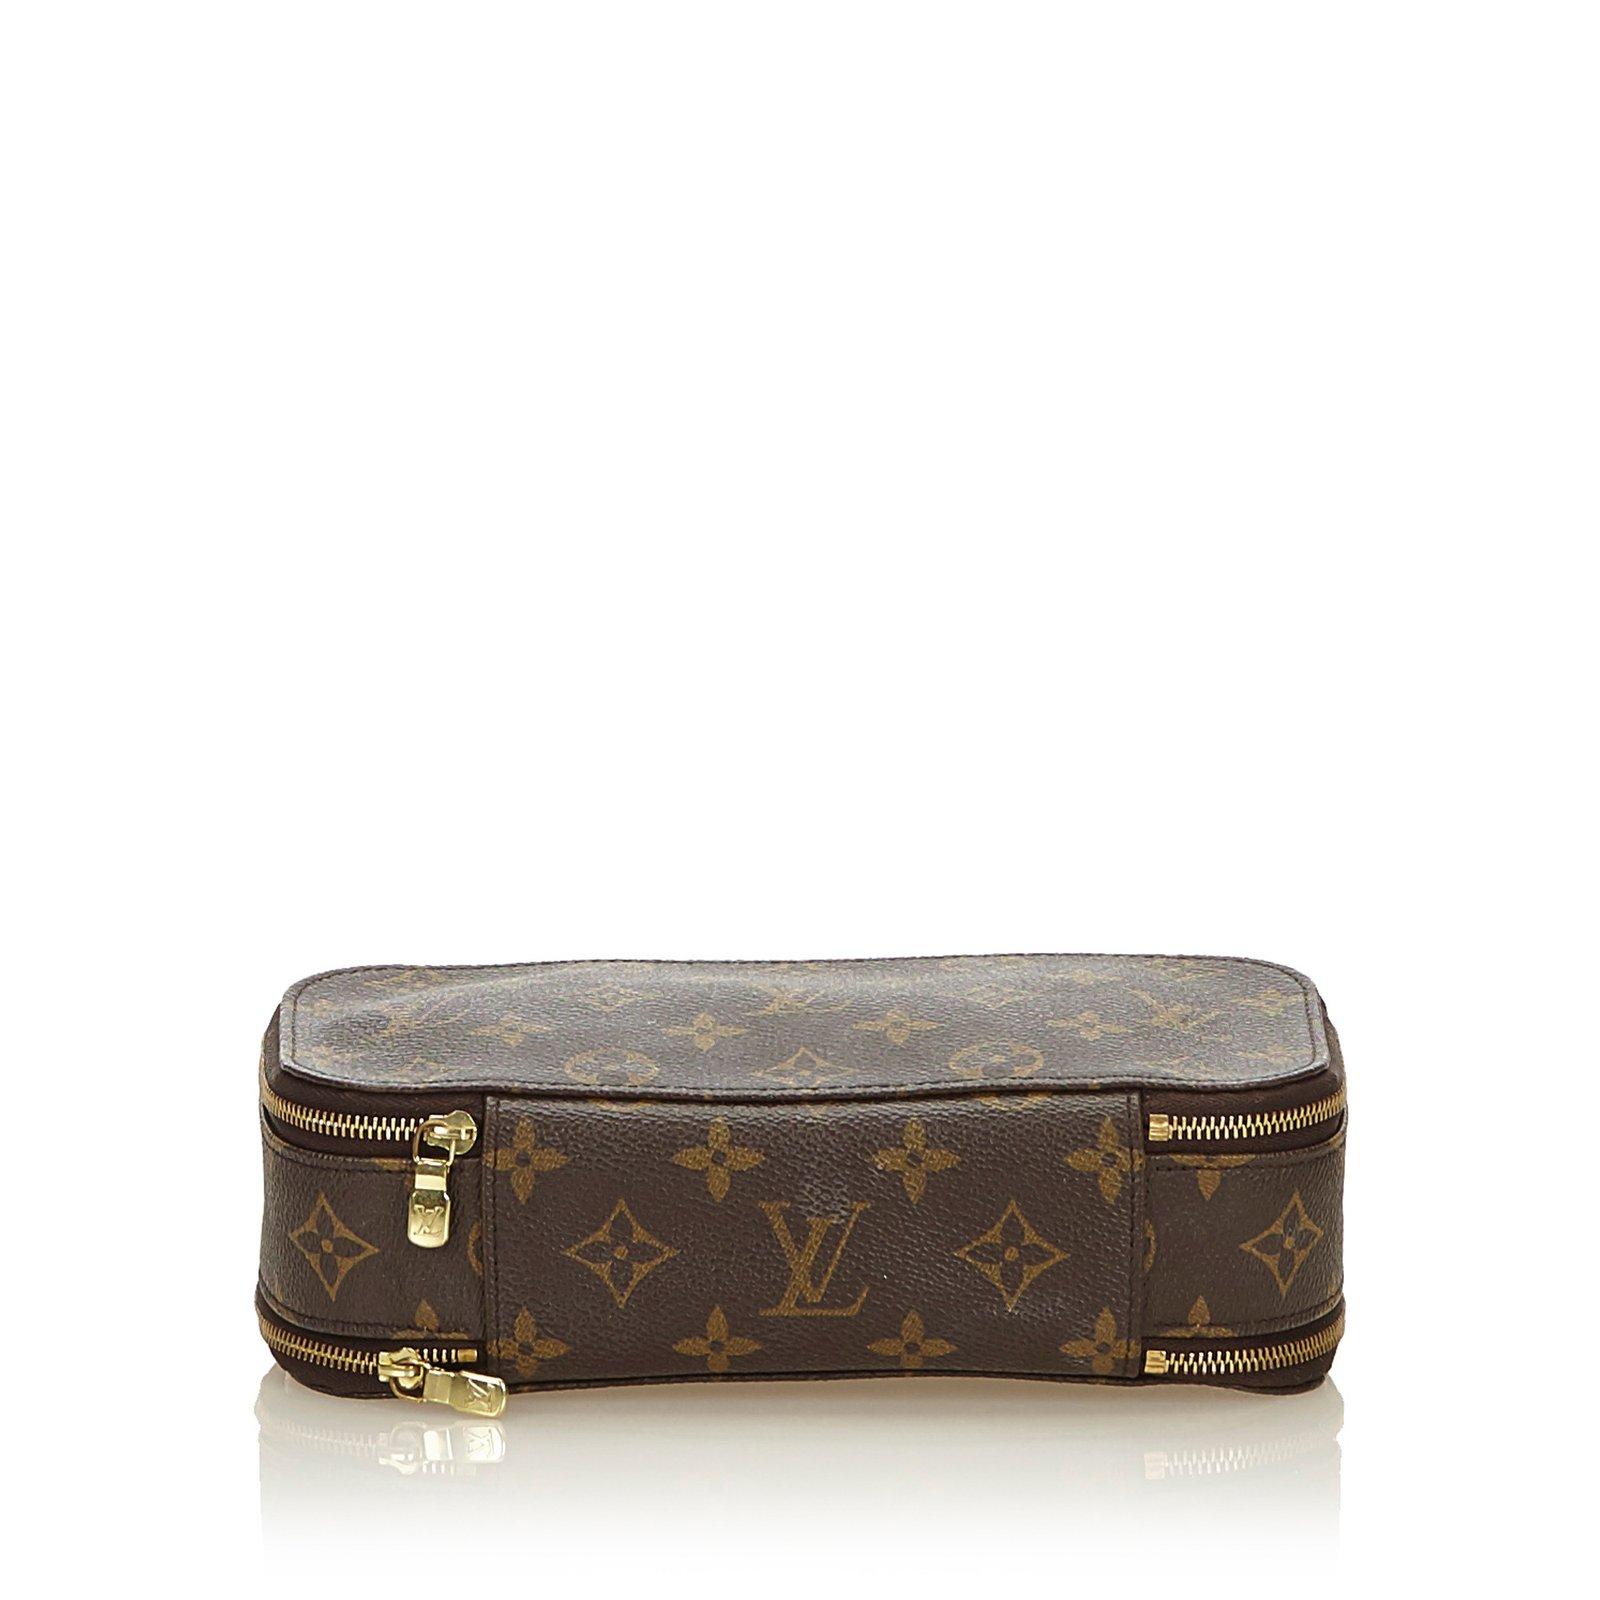 f02b28ab6c3c Louis Vuitton Monogram Trousse Blush PM Purses